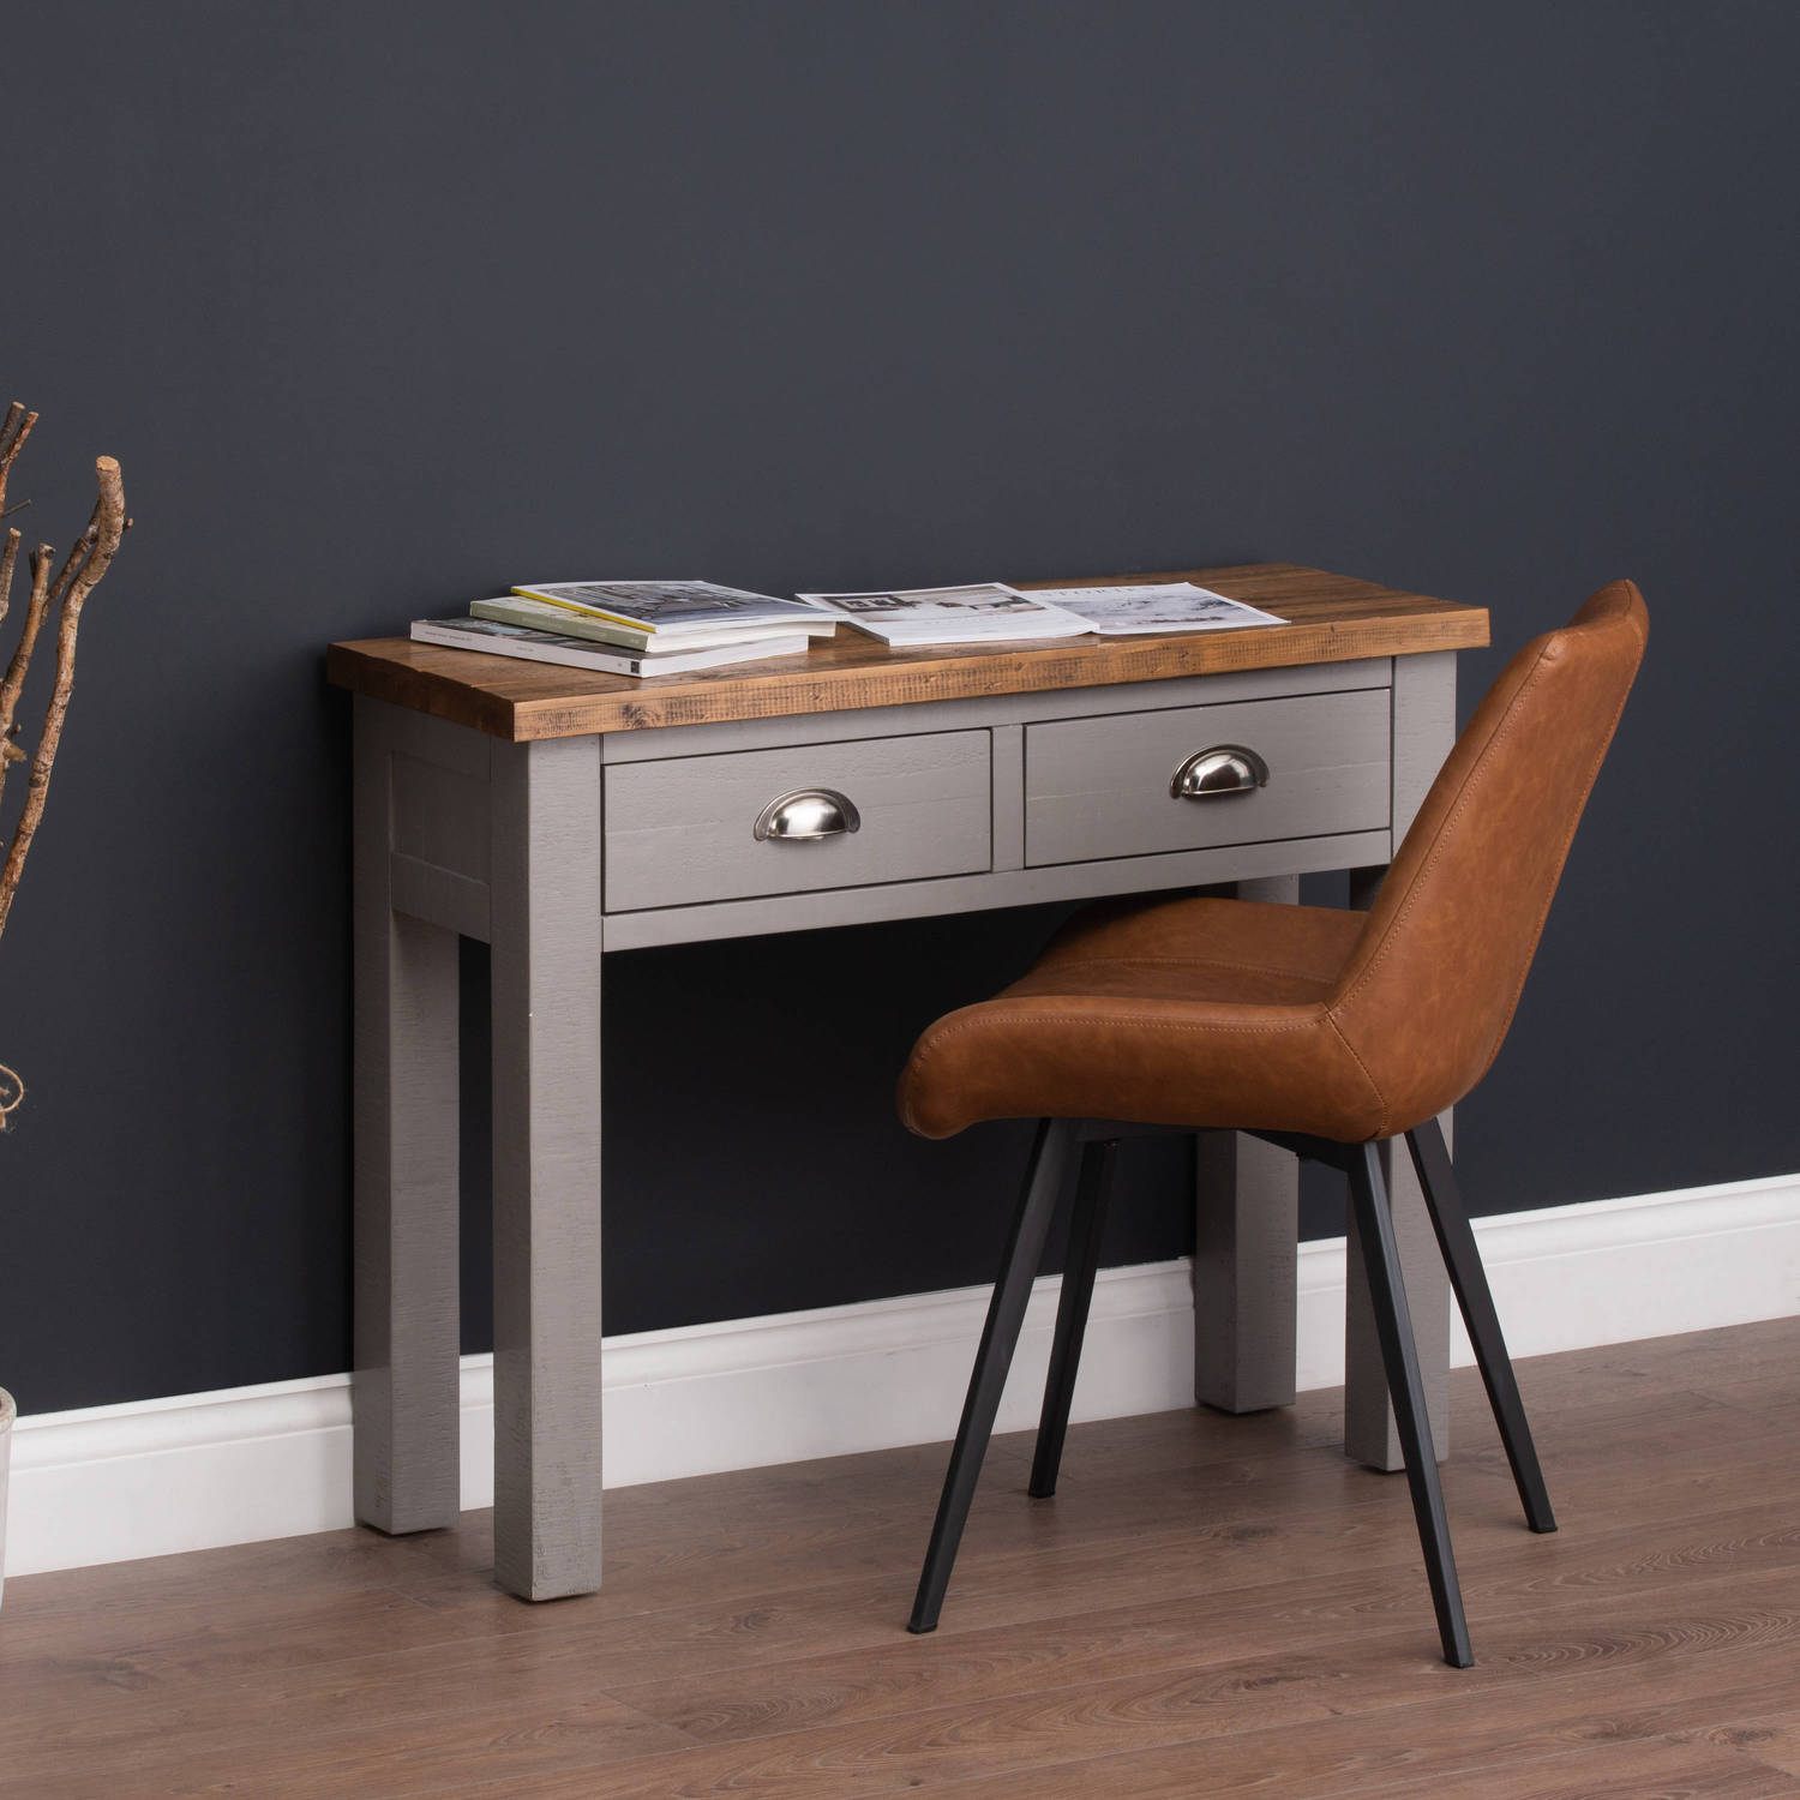 Malmo Tan Dining Chair - Image 6